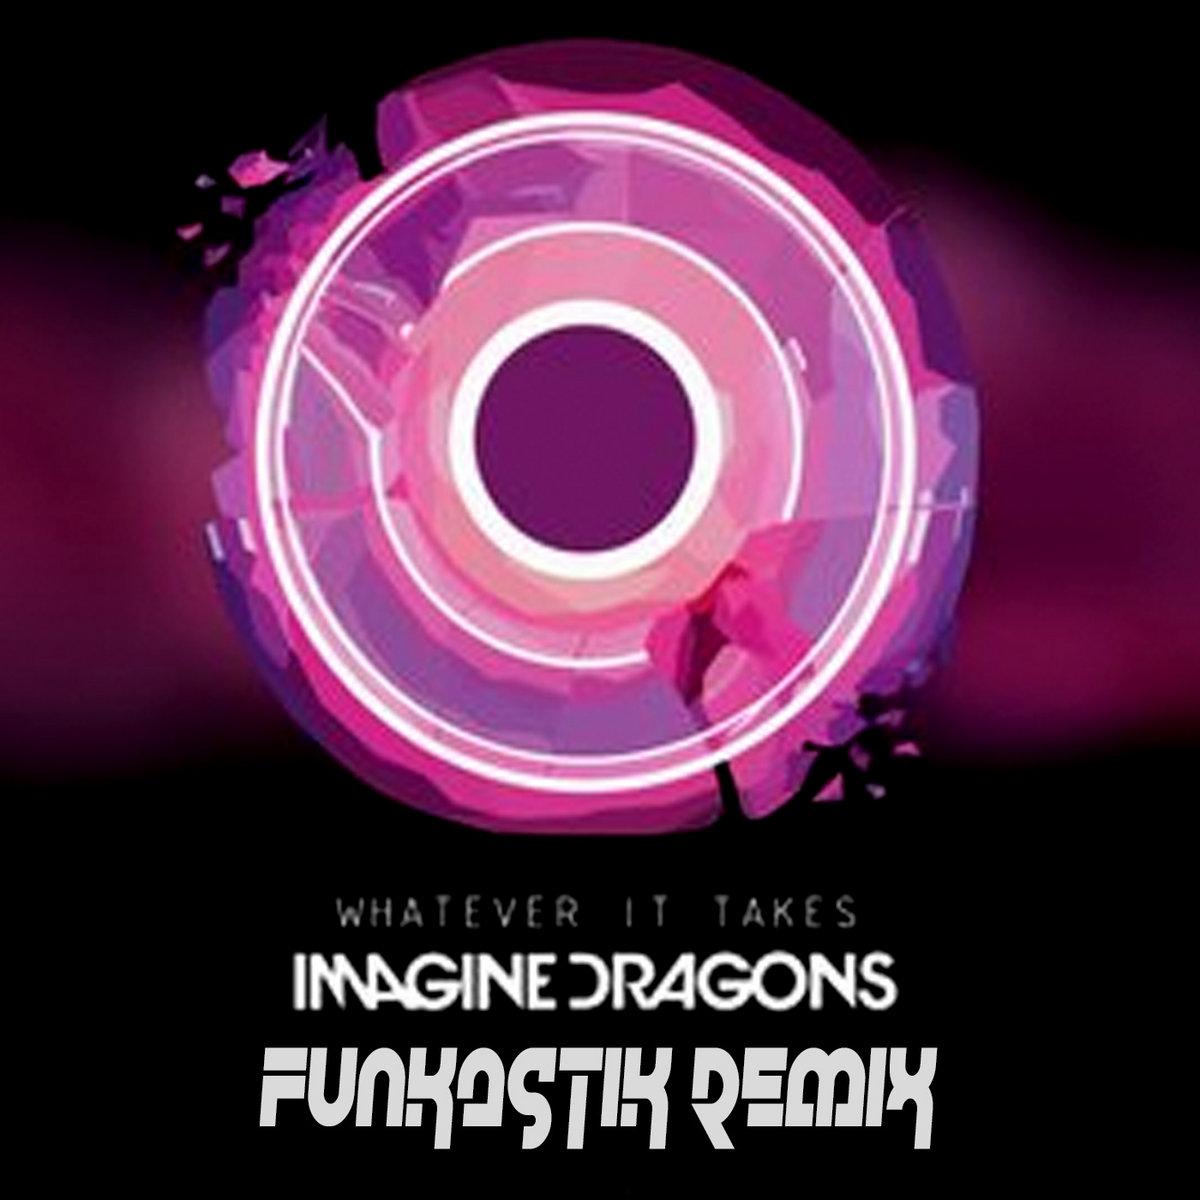 Imagine Dragons Whatever It Takes Funkastik Remix Funkastik